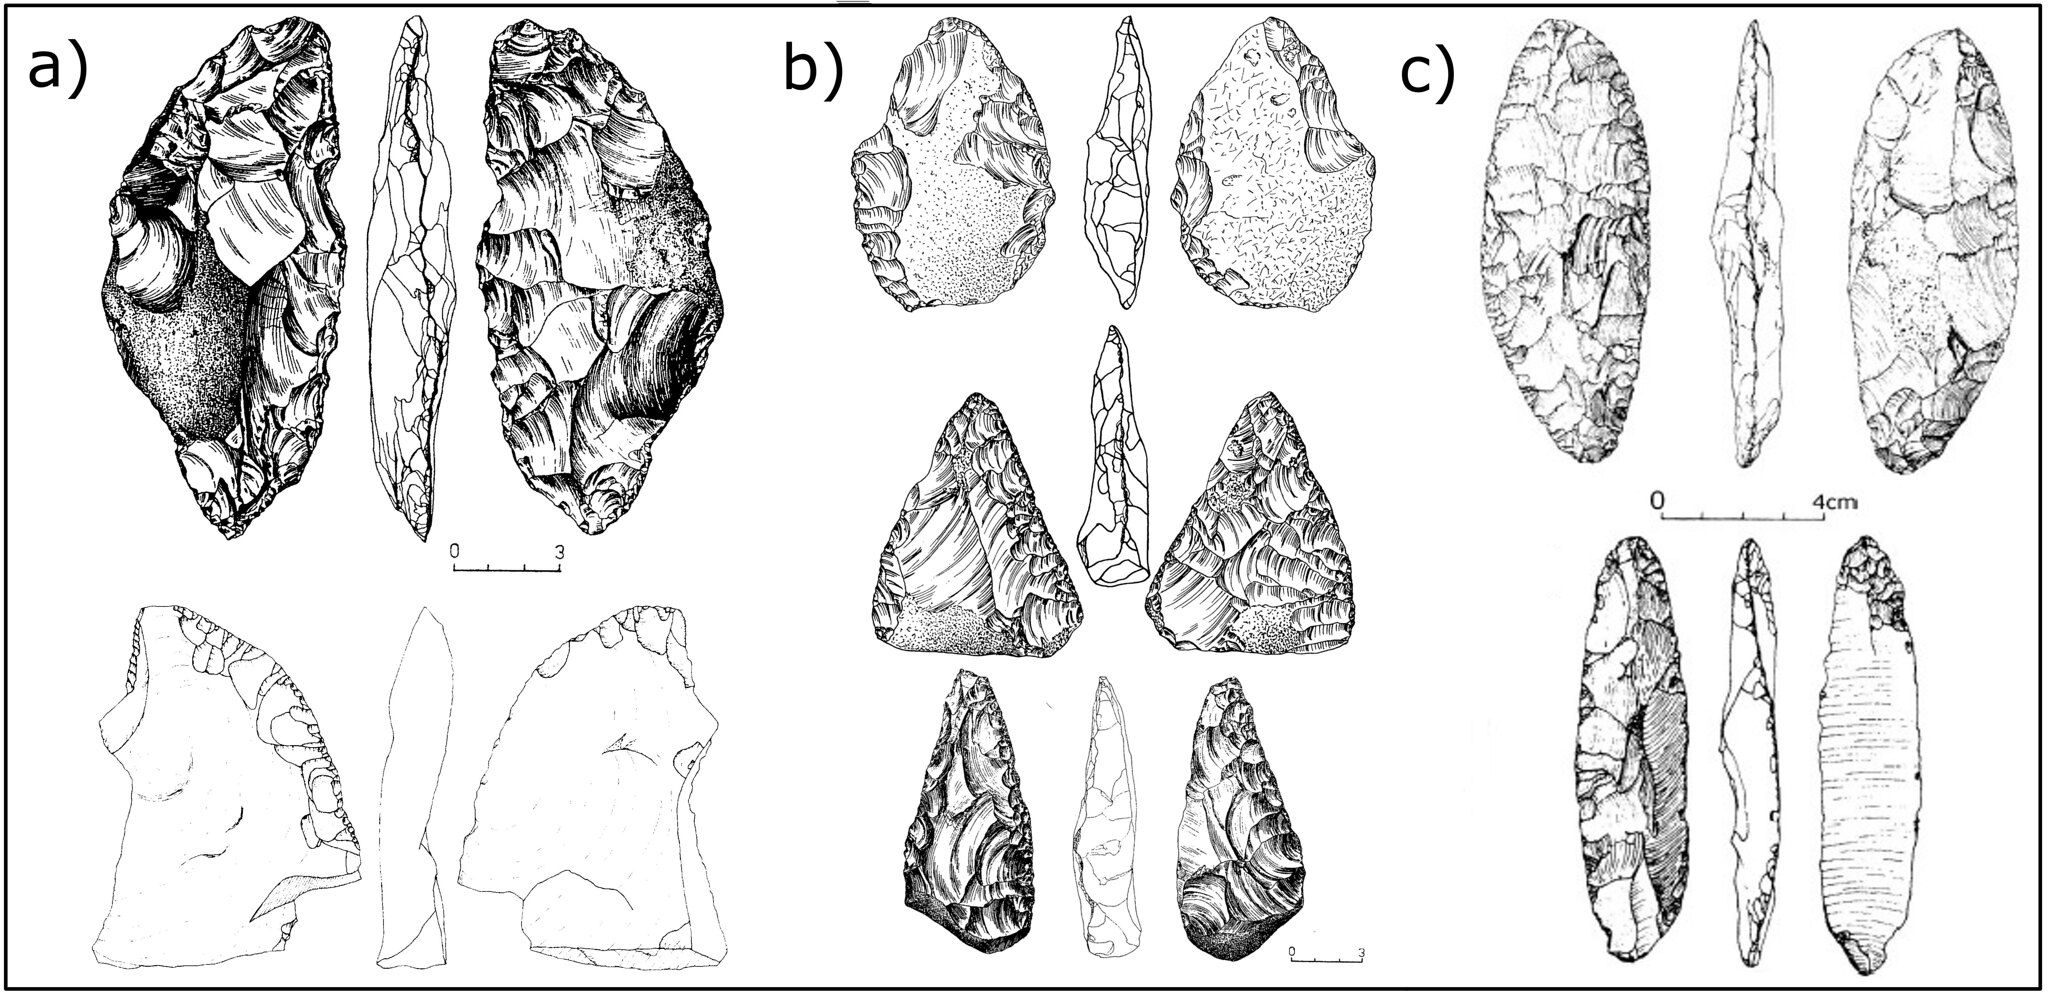 Handaxe Keilmesser morphometrics palaeolithic